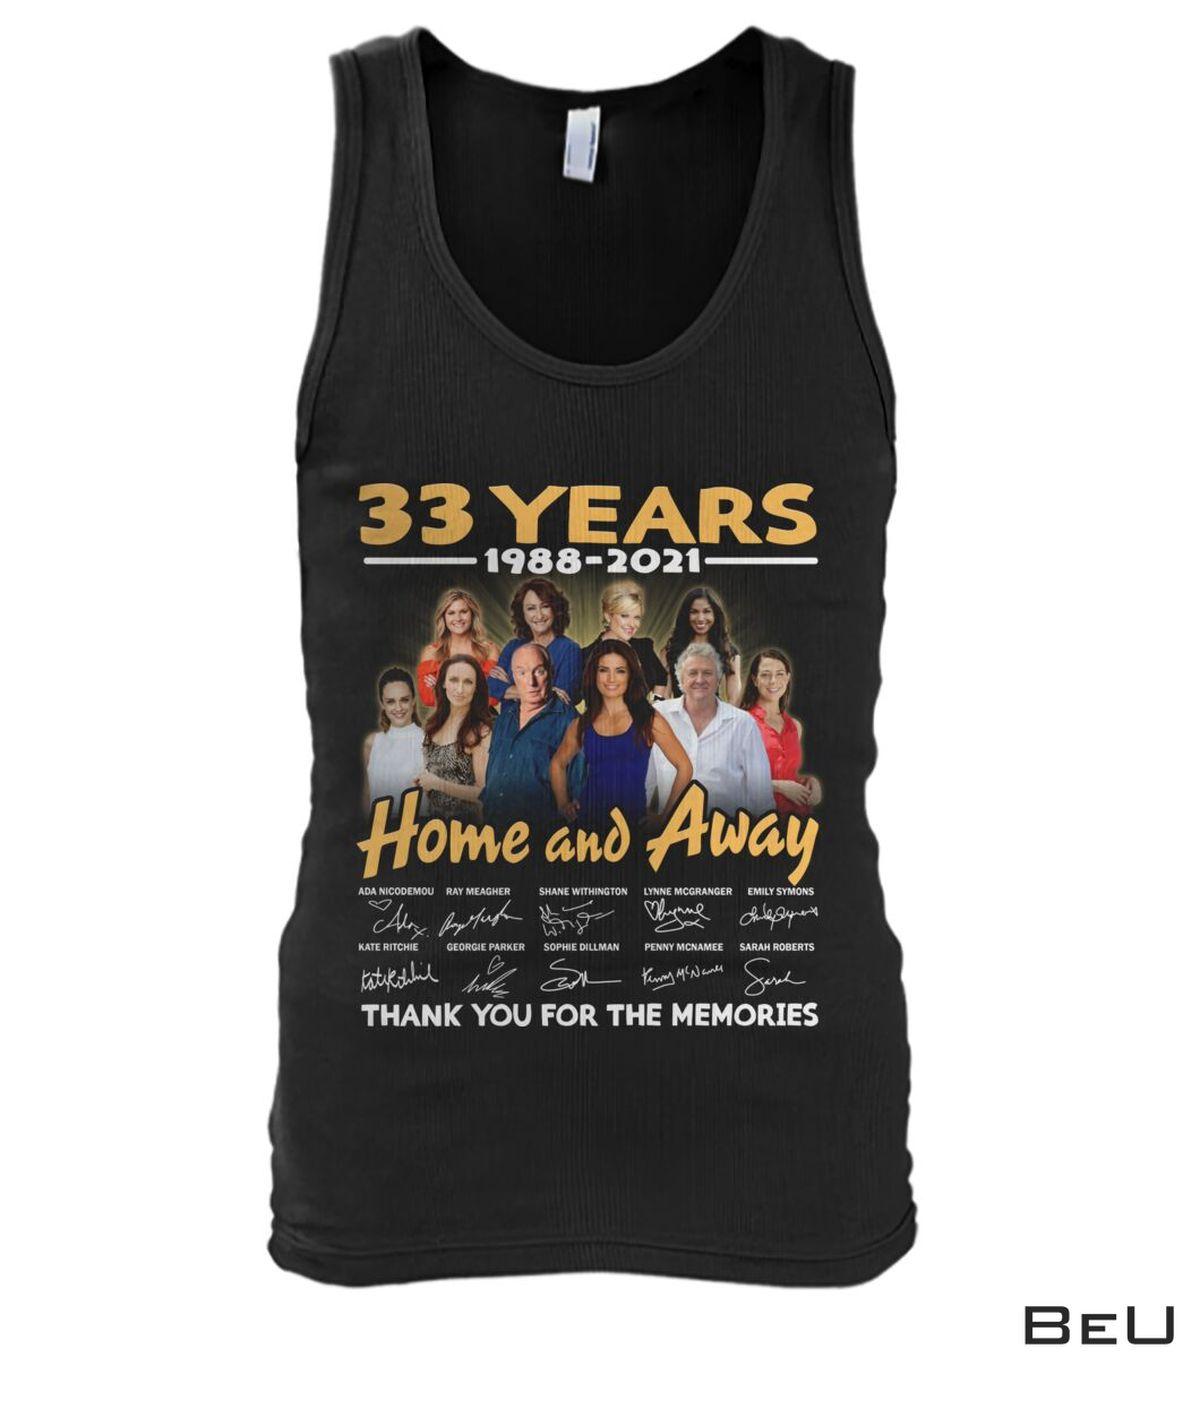 Hot 33 Years Anniversary Home And Away Shit, hoodie, tank top